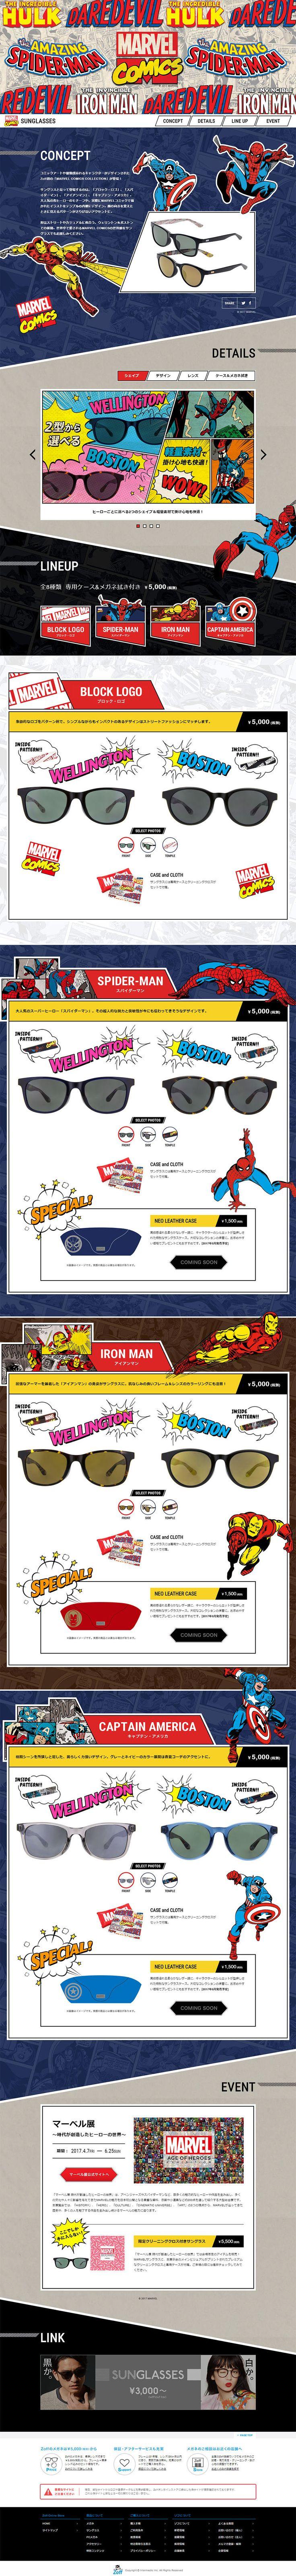 MARVEL COMICS SUNGLASSES|WEBデザイナーさん必見!ランディングページのデザイン参考に(かっこいい系)